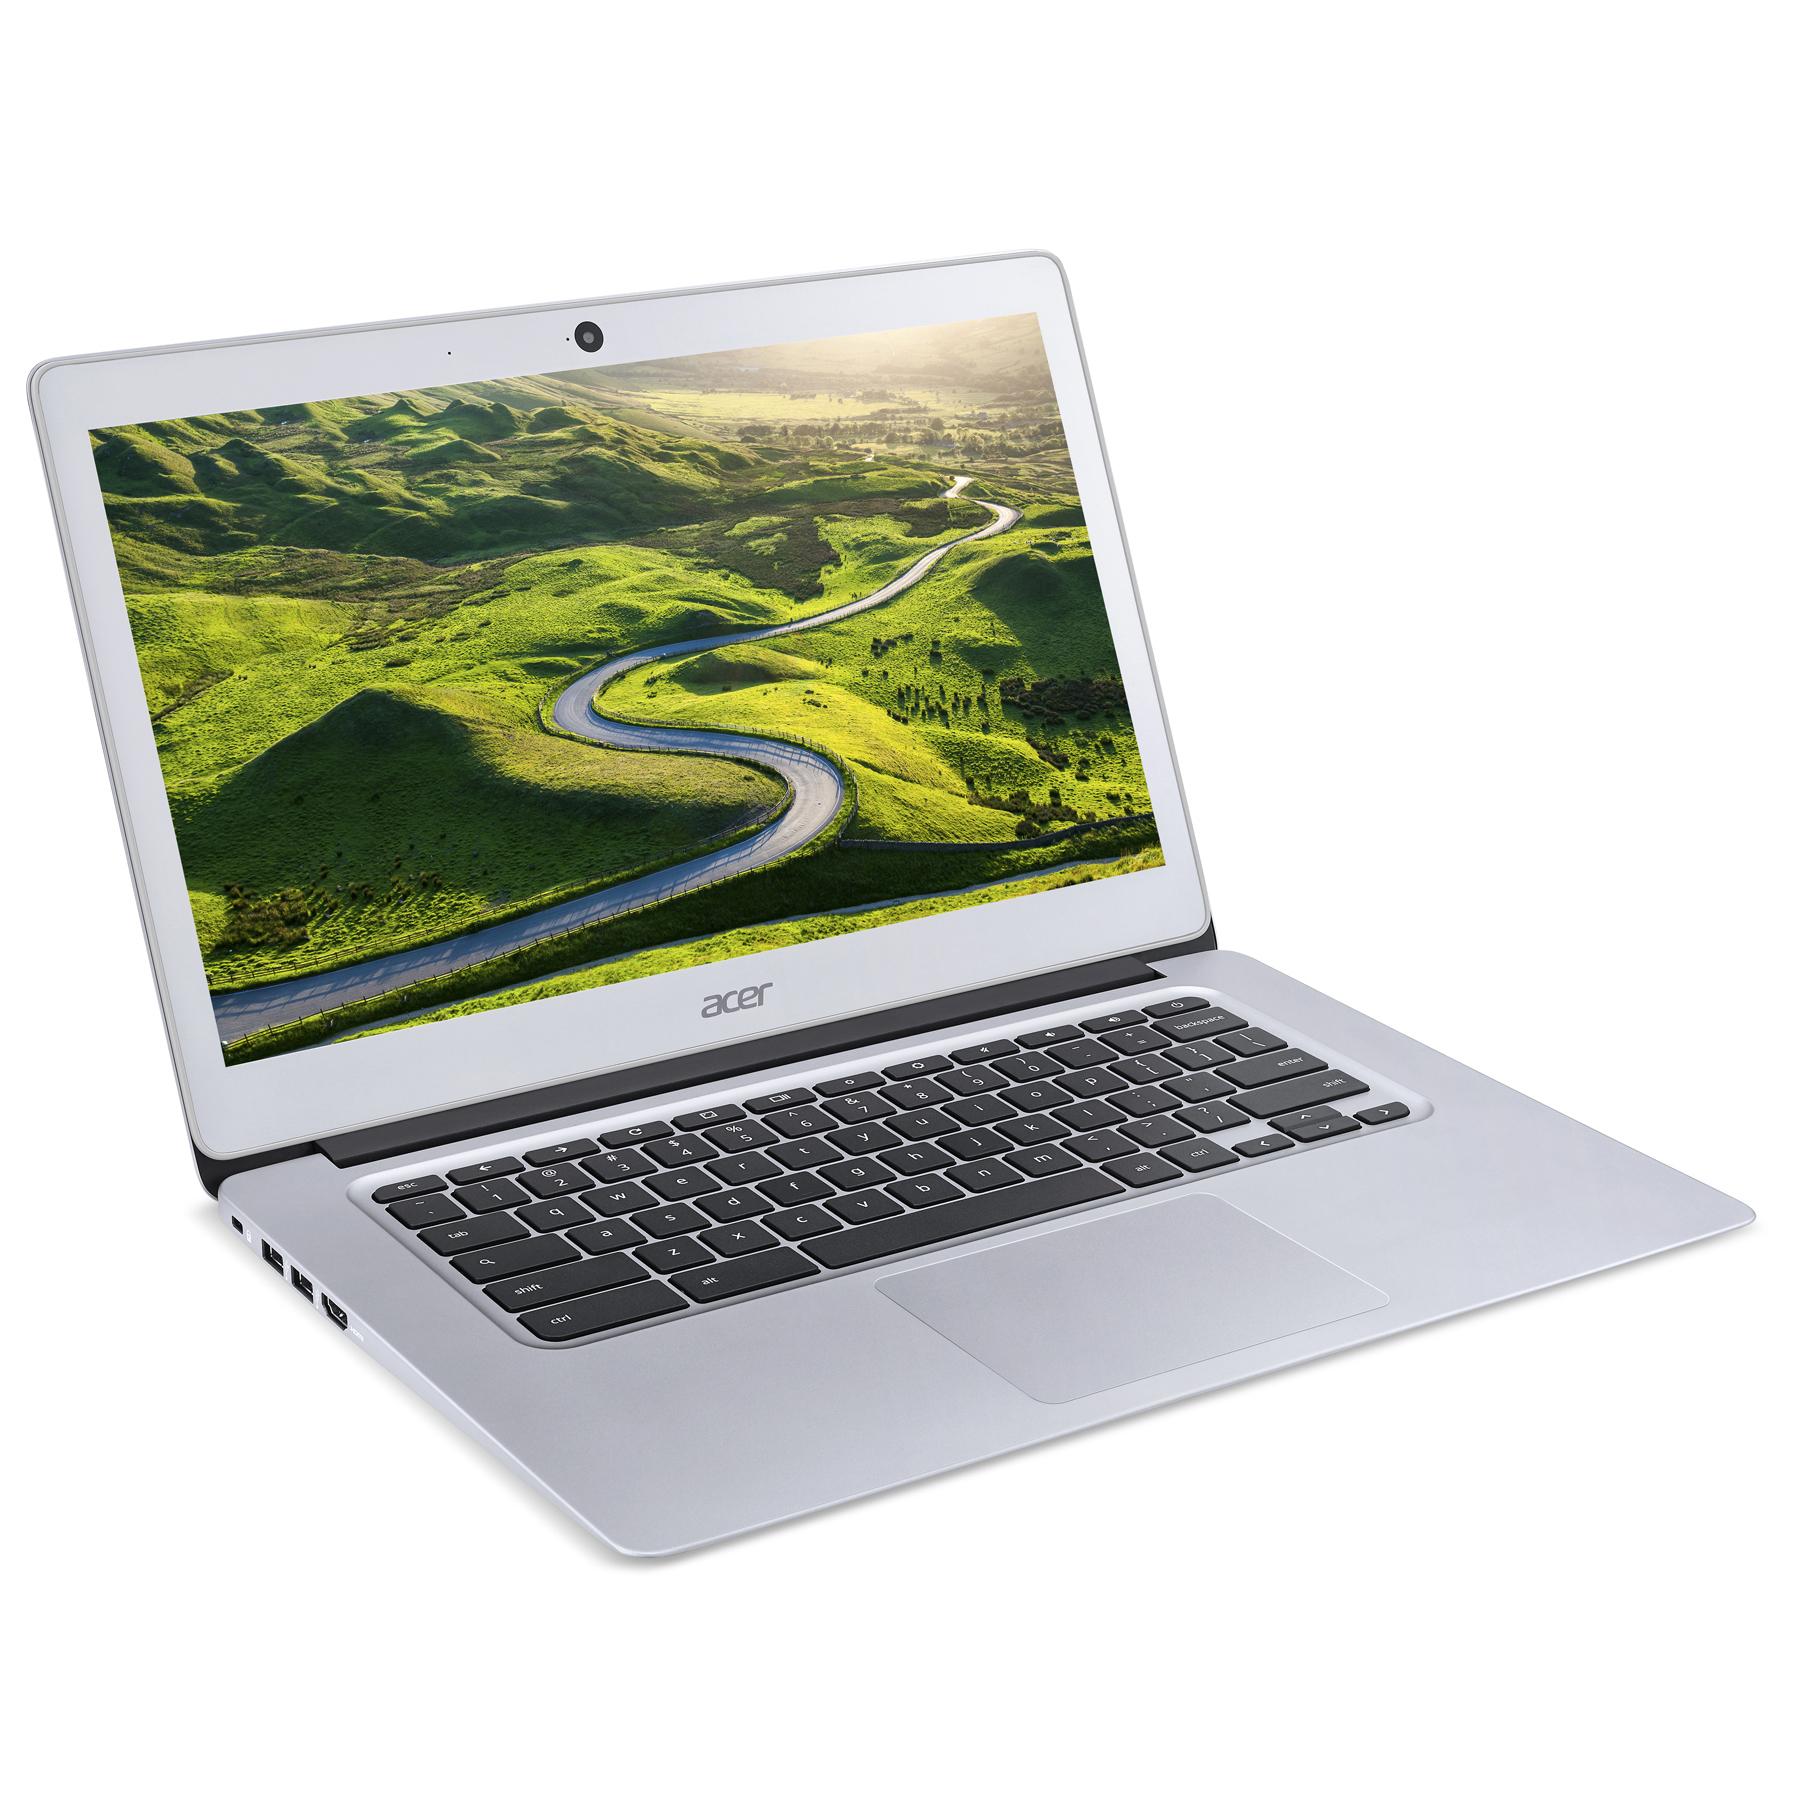 "[NBB] Acer Chromebook 14 CB3-431-C6UD 14"" Full HD IPS, Intel Celeron Quad-Core, 4GB RAM, 32GB Speicher, Chrome OS (mit Masterpass nur 269,99€)"